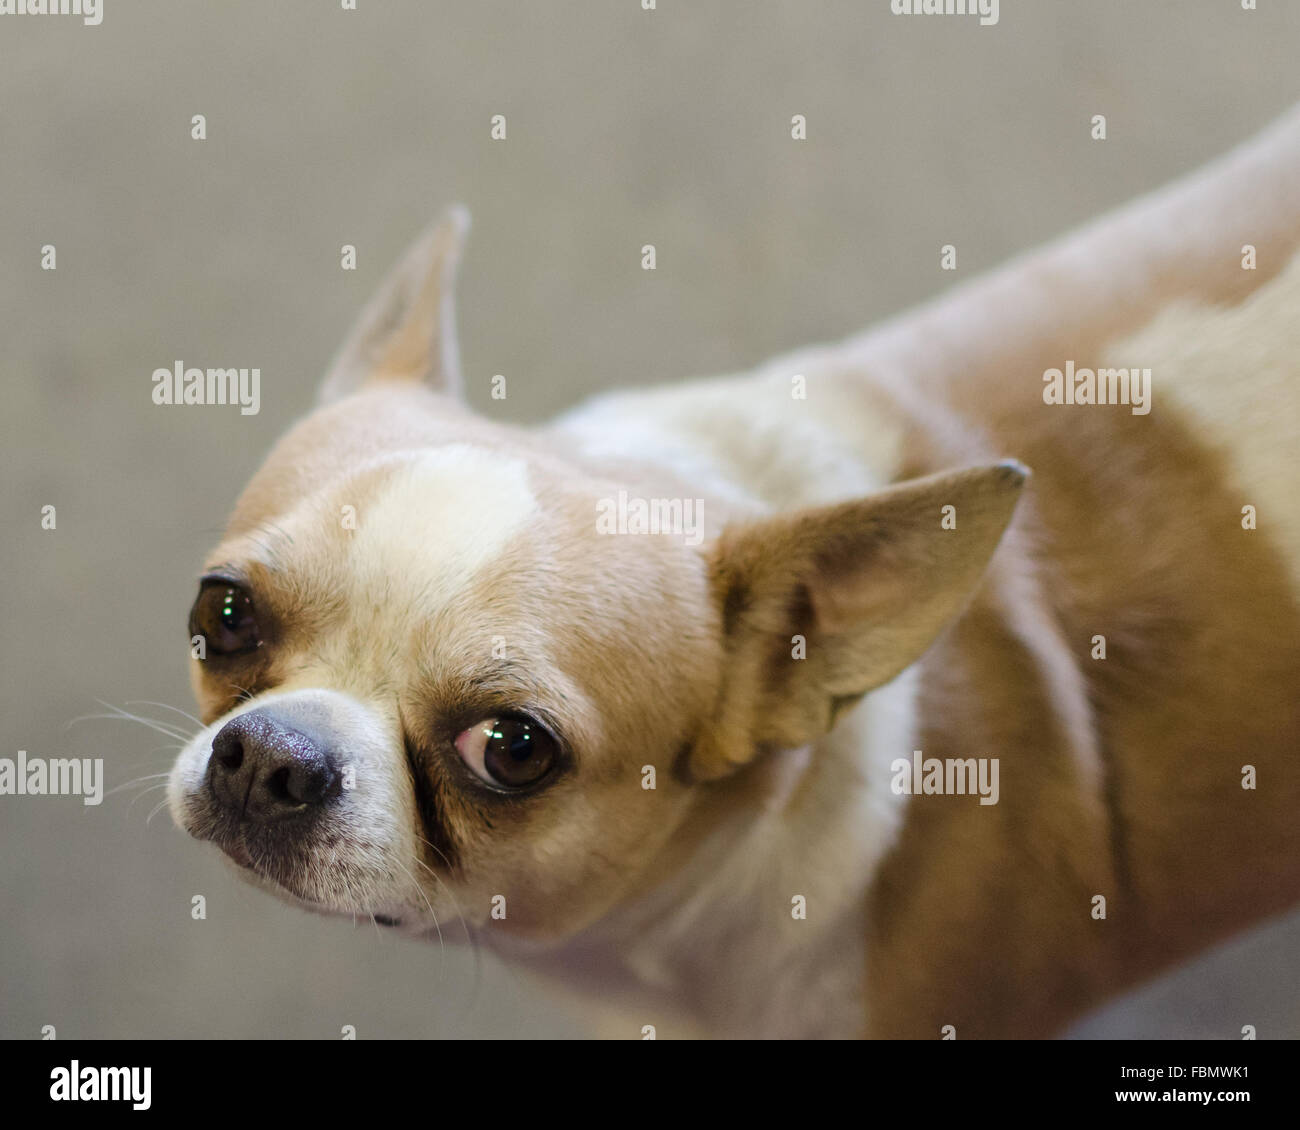 Amazing Chihuahua Chubby Adorable Dog - chubby-chihuahua-FBMWK1  Collection_84968  .jpg